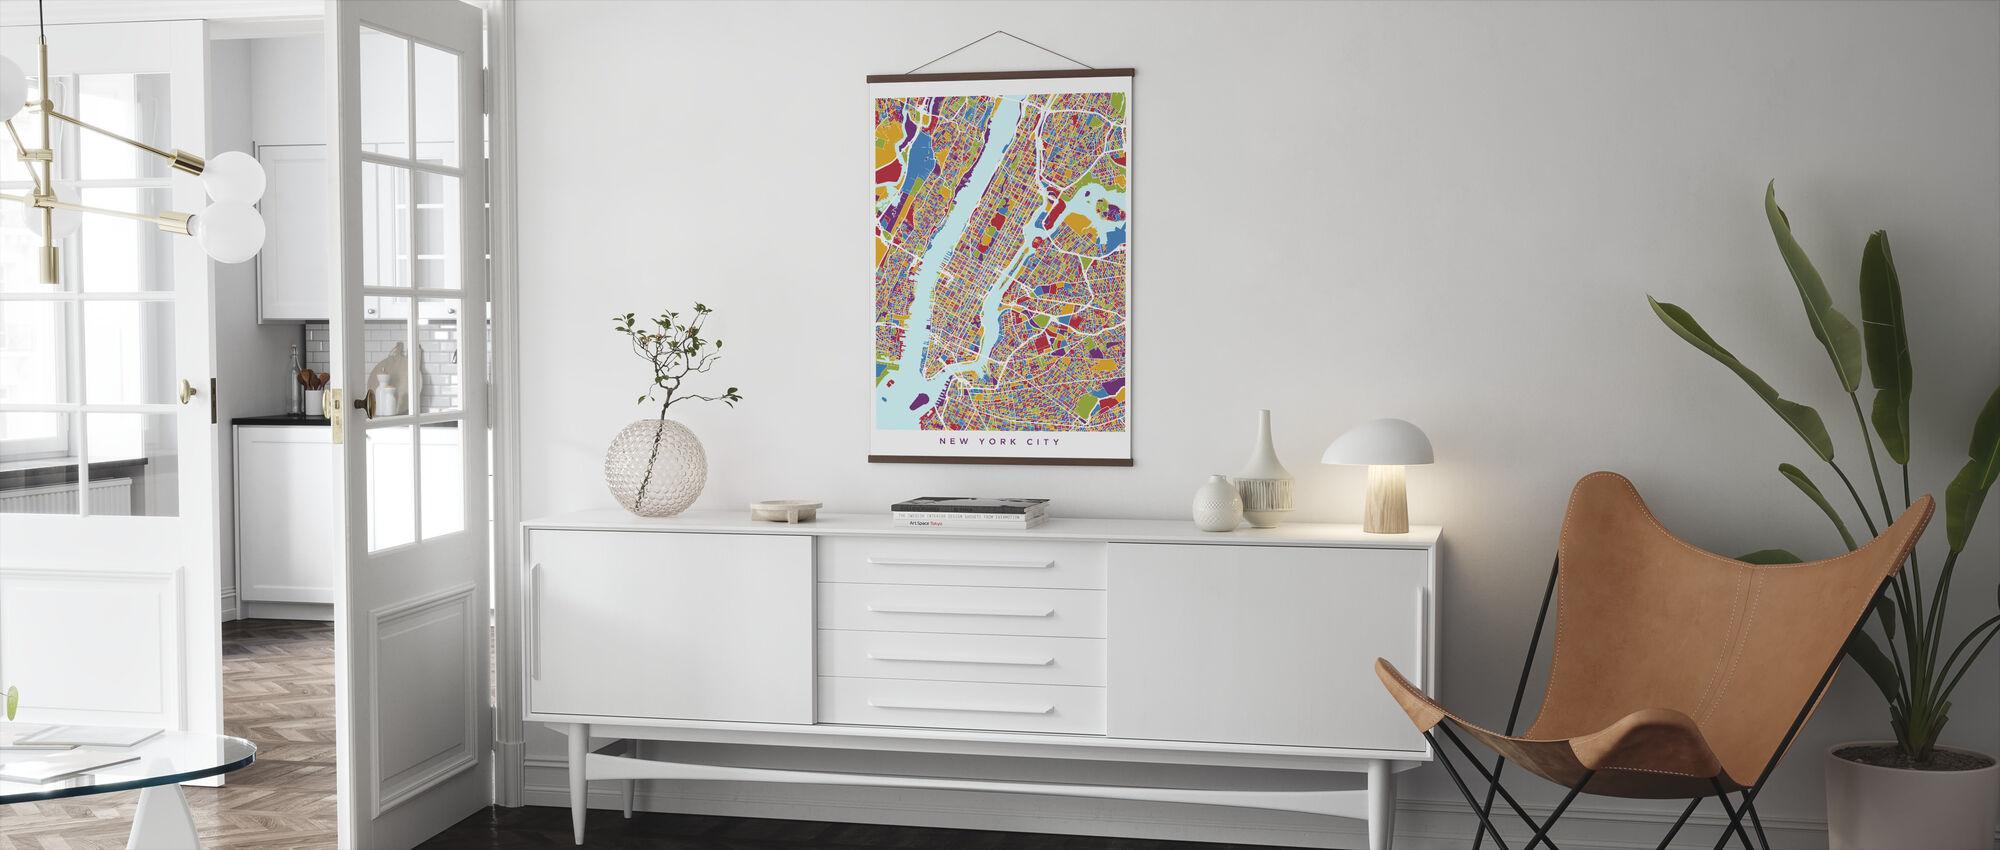 New York City Street Map - Poster - Living Room